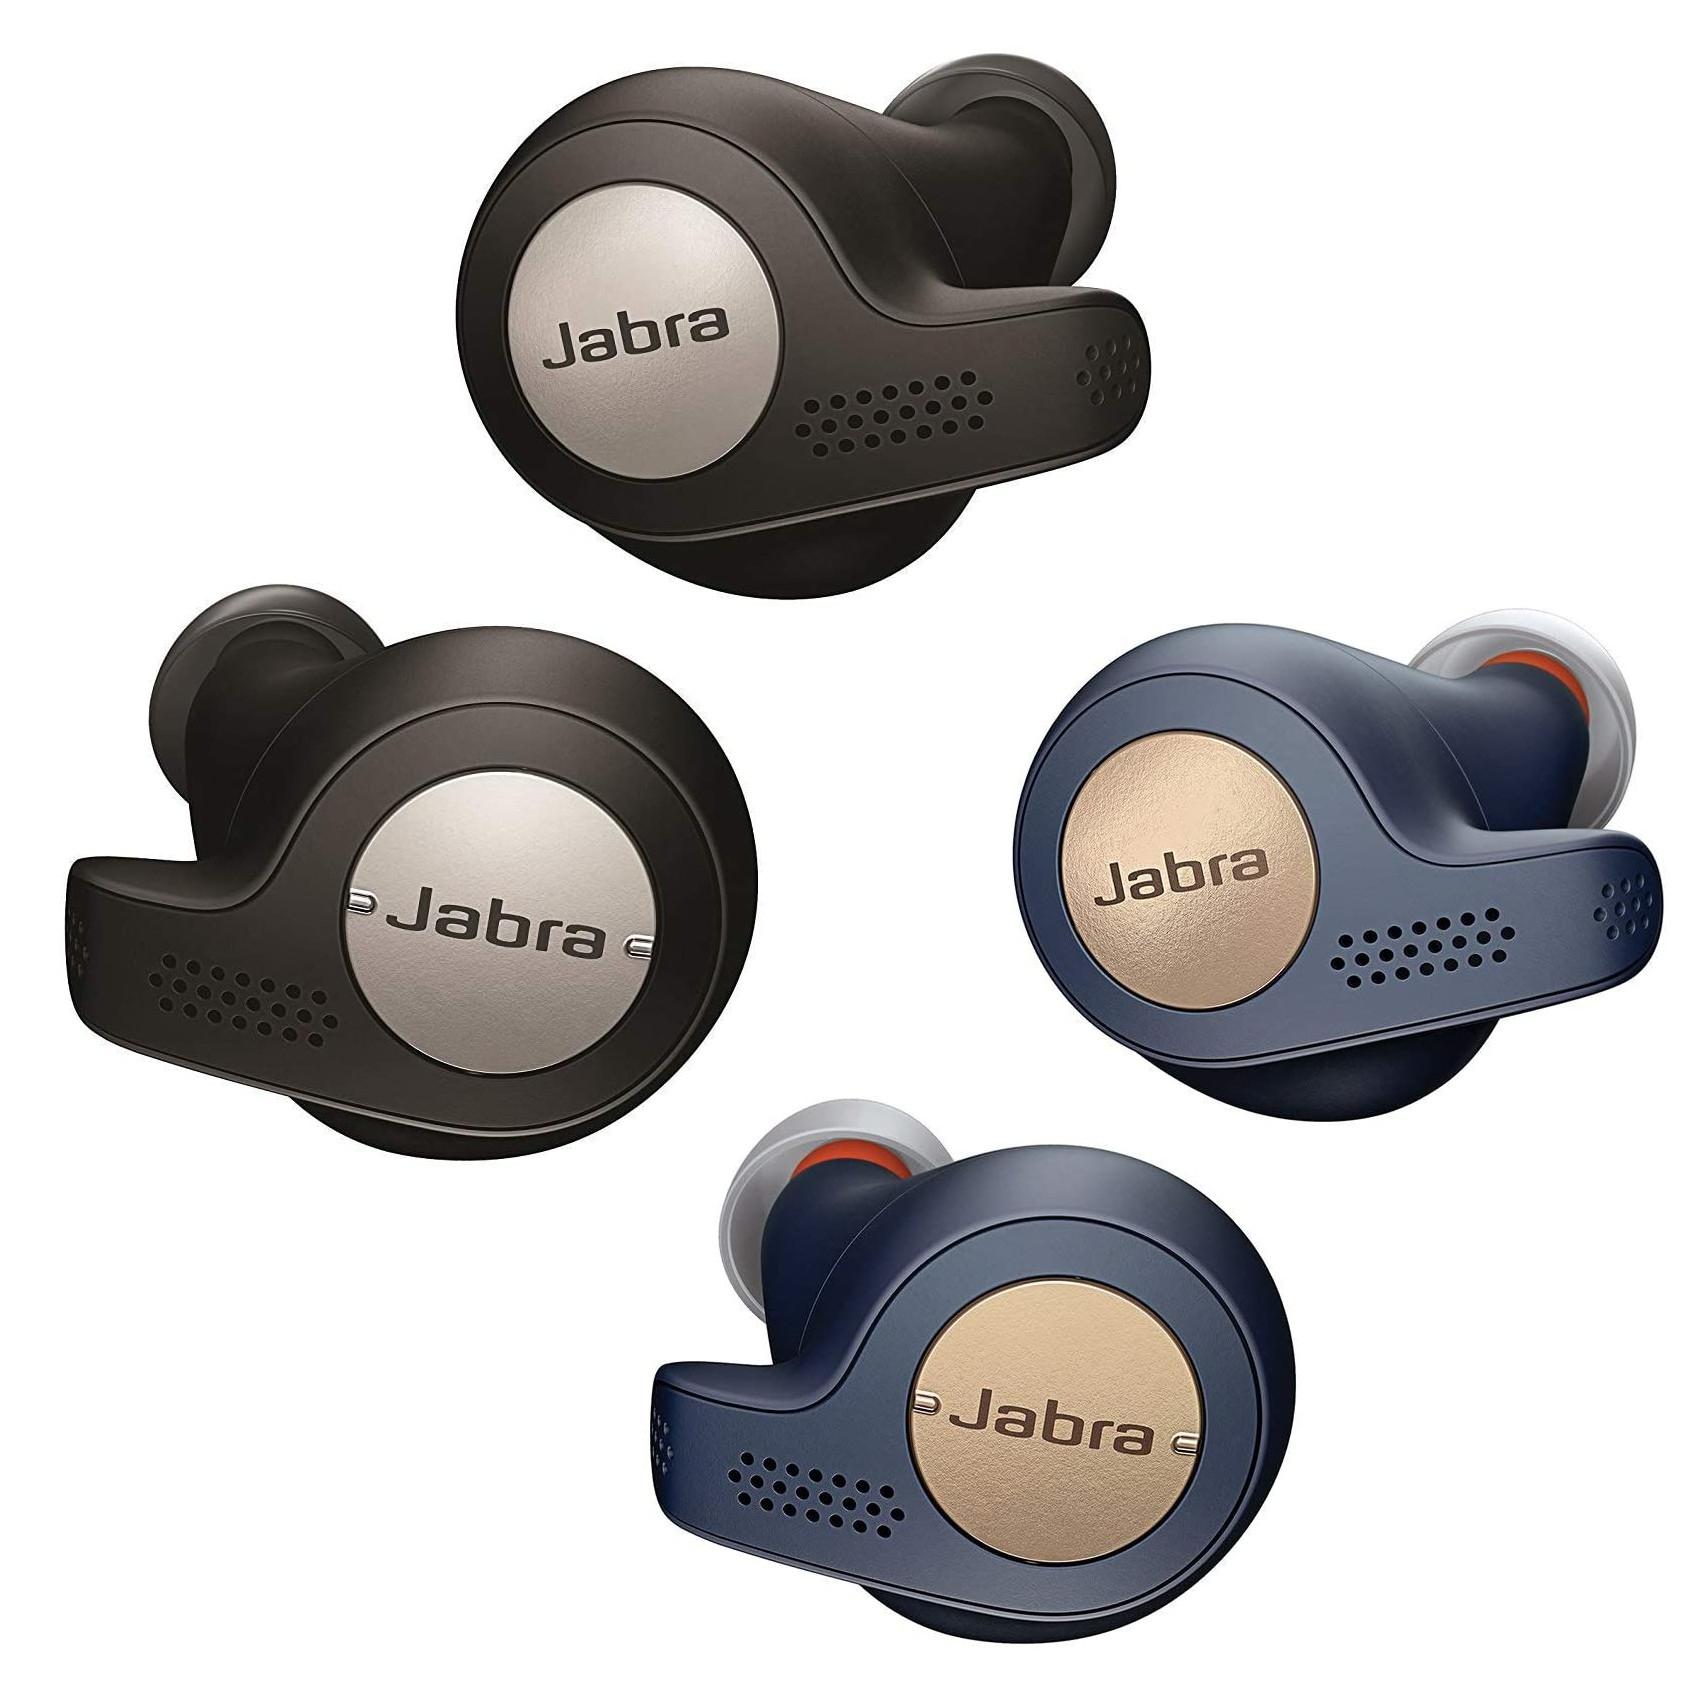 Jabra Elite Active 65t True Wireless Sweat & Weather-Resistant Bluetooth In-Ear Headphones Black/Copper Blue- £39.99 @ John Lewis & Partners